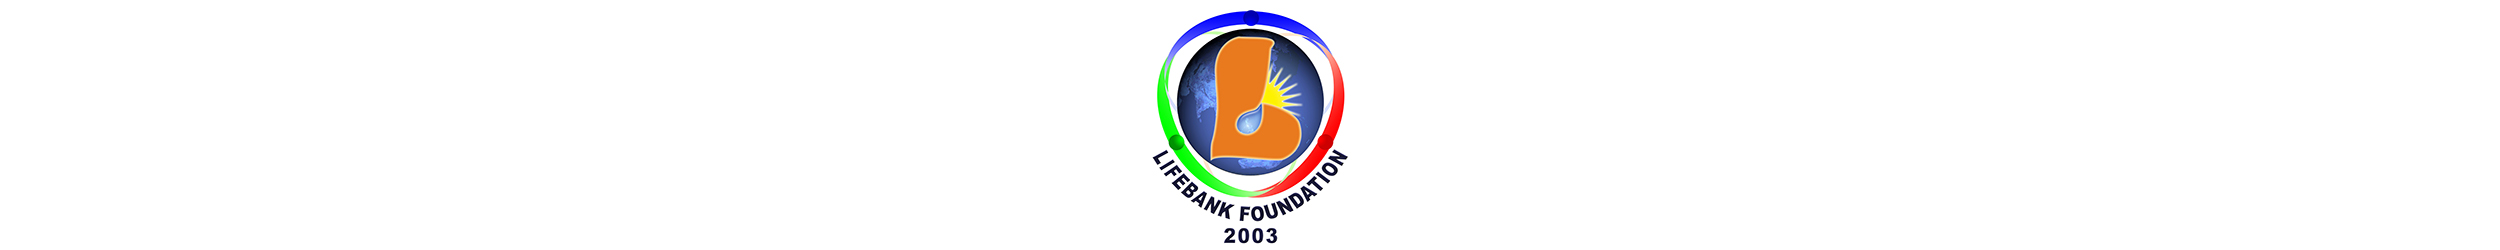 LifeBank Foundation